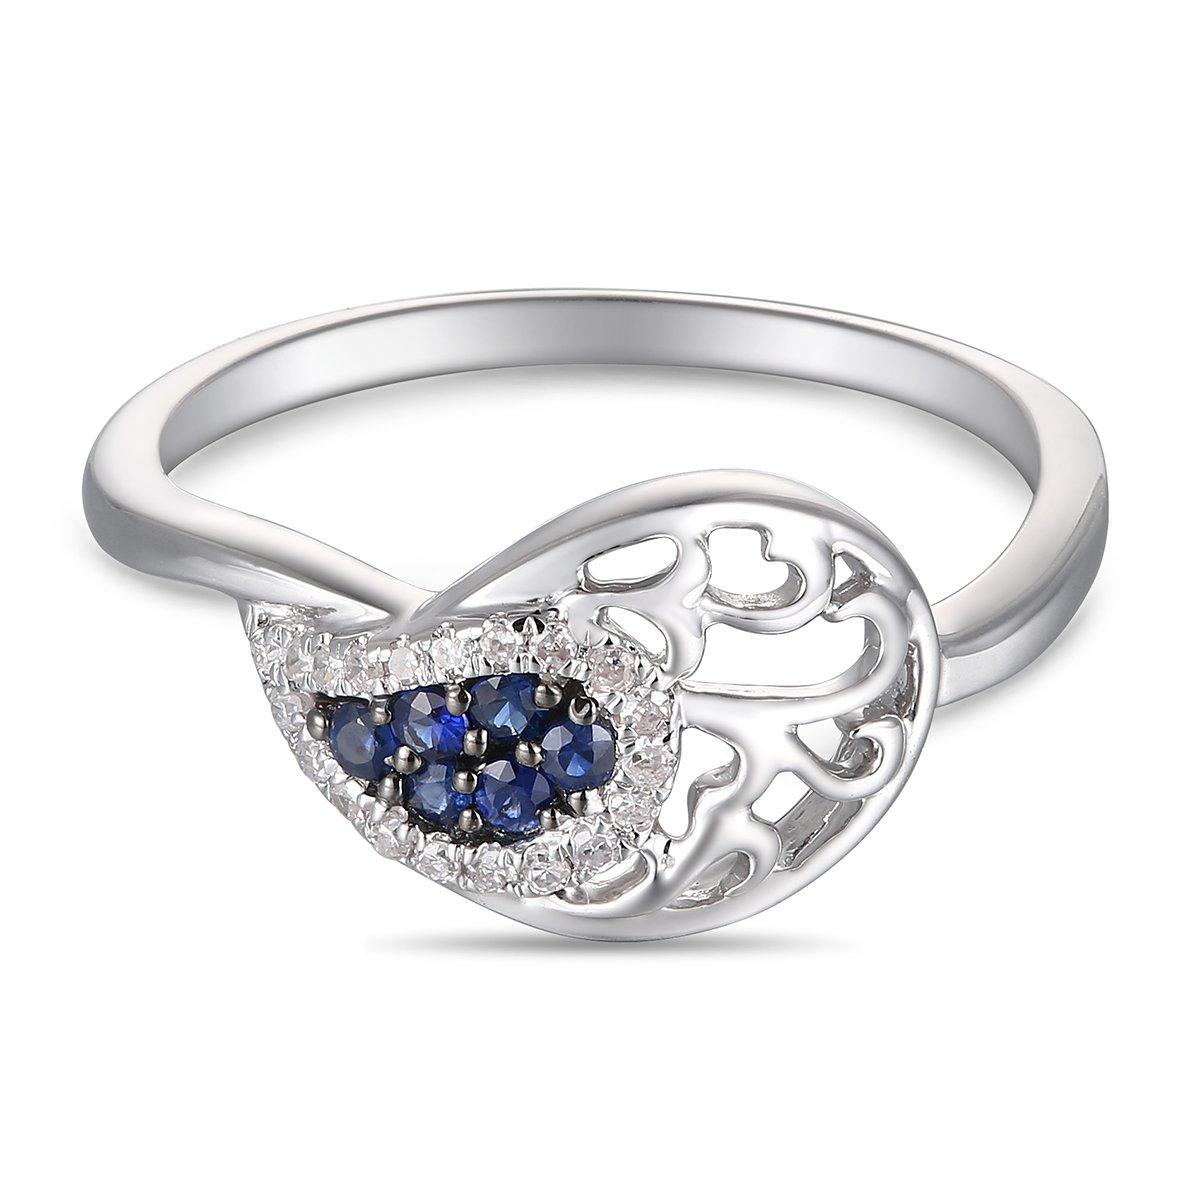 Ferhe New York 14K Gold, Diamond & Sapphire Ring,Diamond Ring,Sapphire Ring